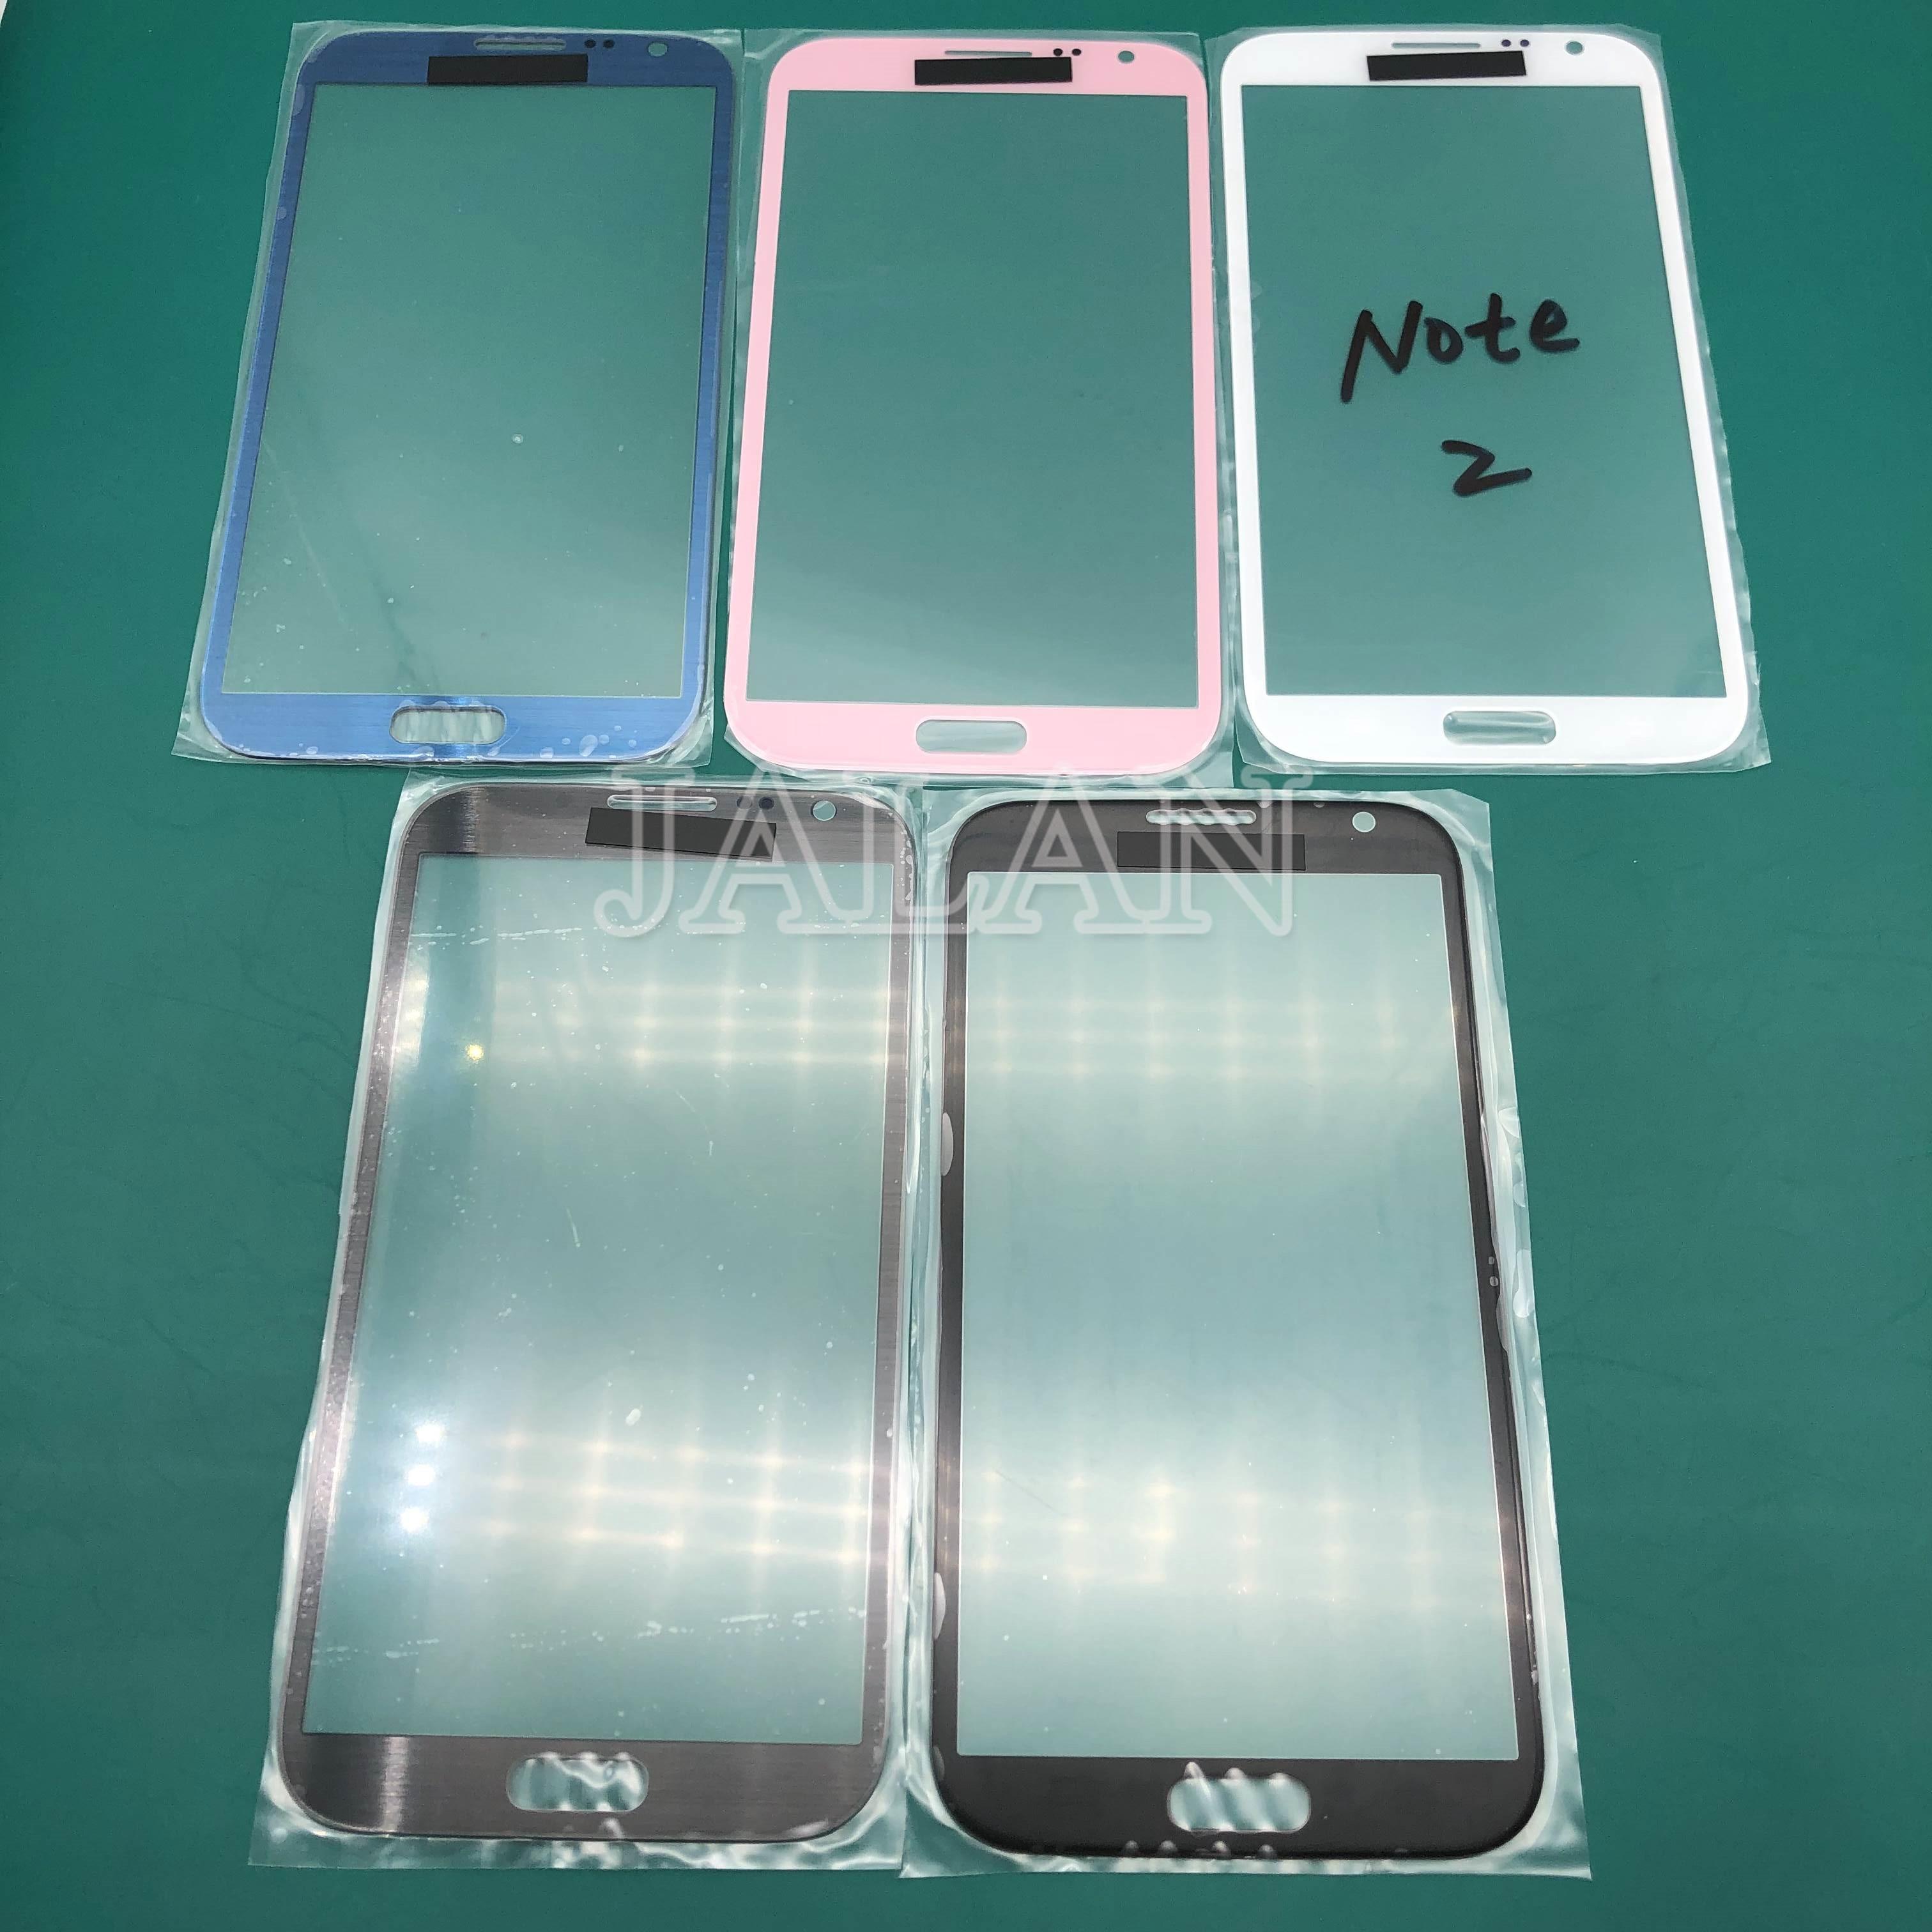 Jalan untuk SM Note 1 2 3 N700 N710 N750 N900 Note 3 NEO Touch Screen Panel Retak Kaca Pengganti perbaikan LCD Kaca Depan